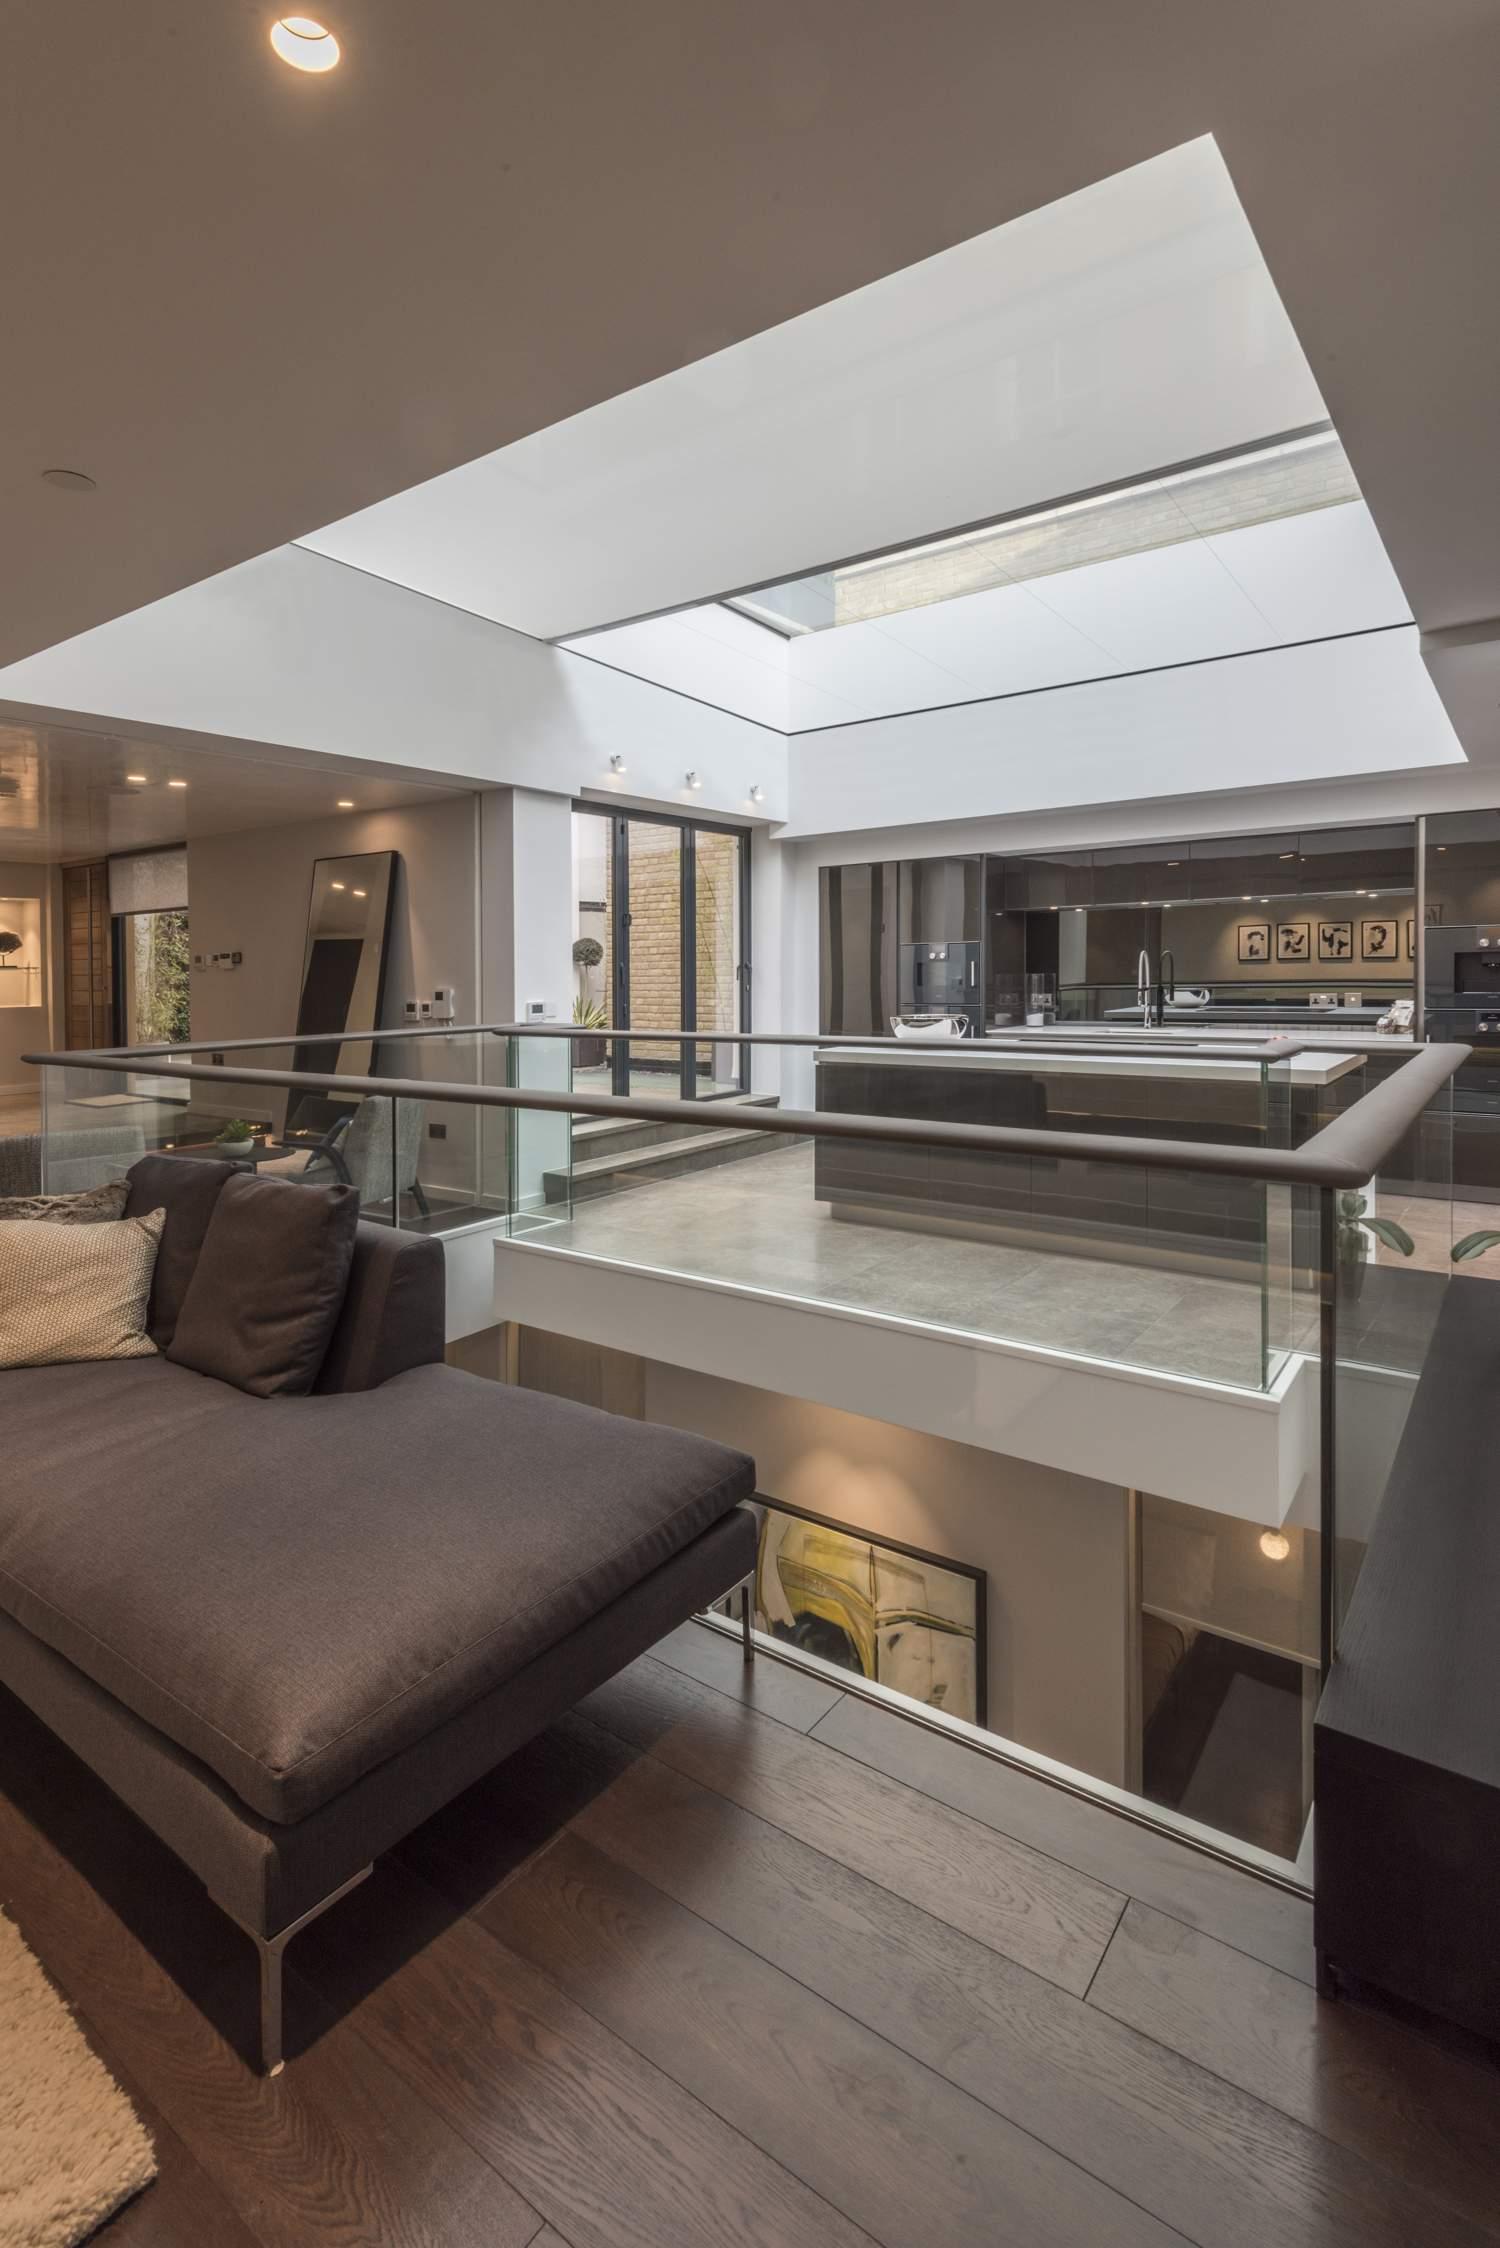 Concealed Rooflight Blinds